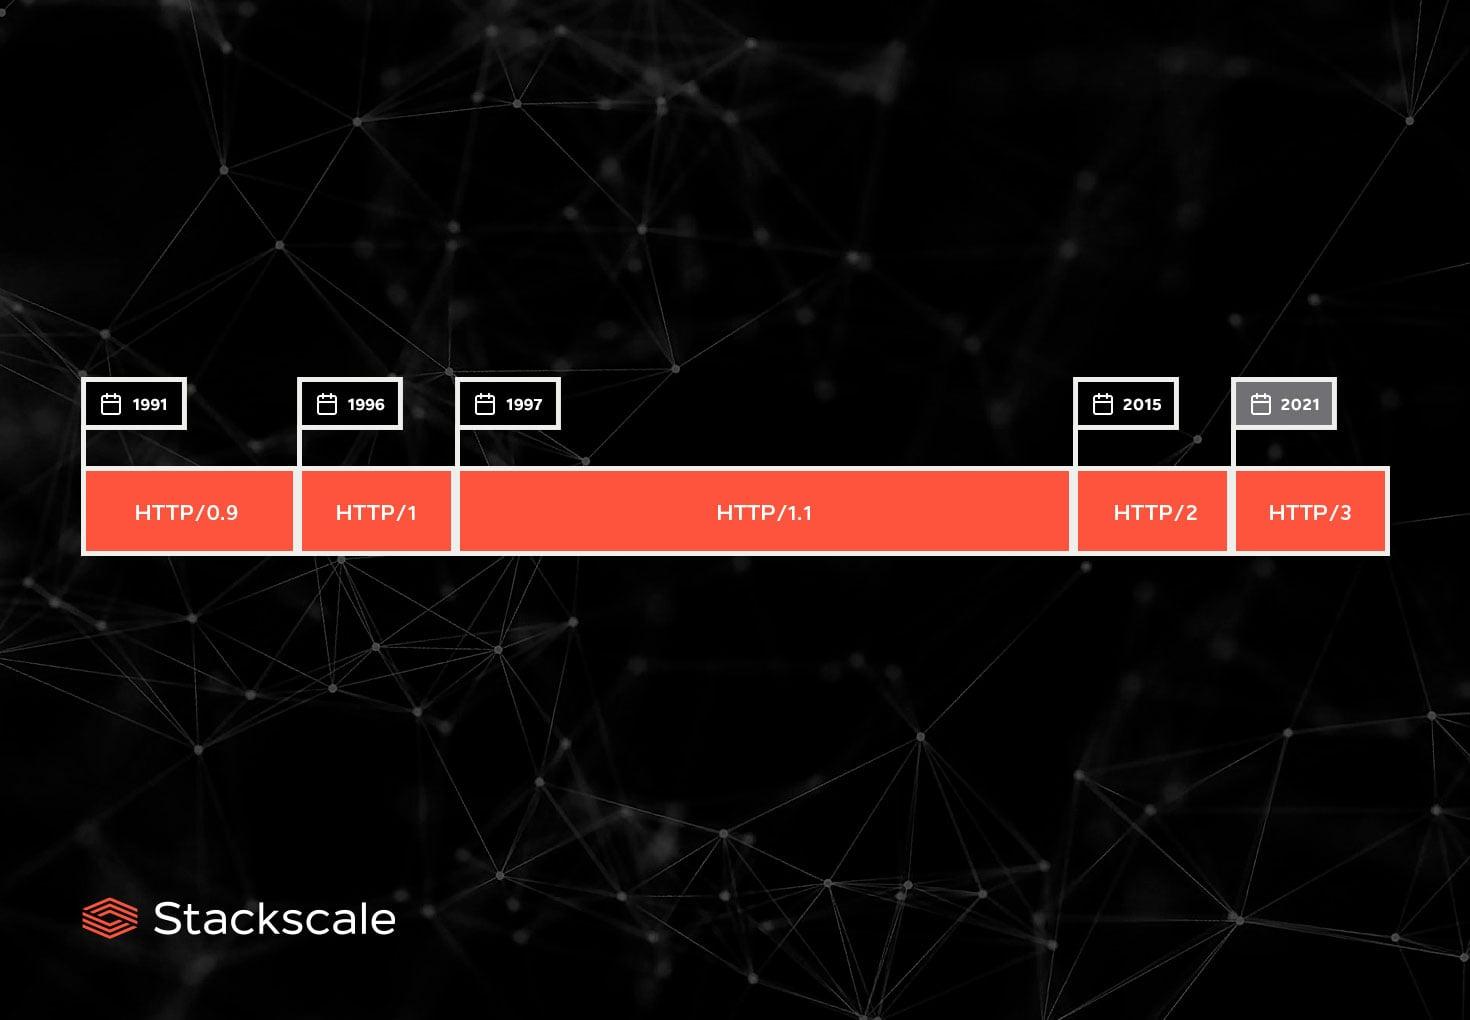 Cronología de HTTP de Stackscale